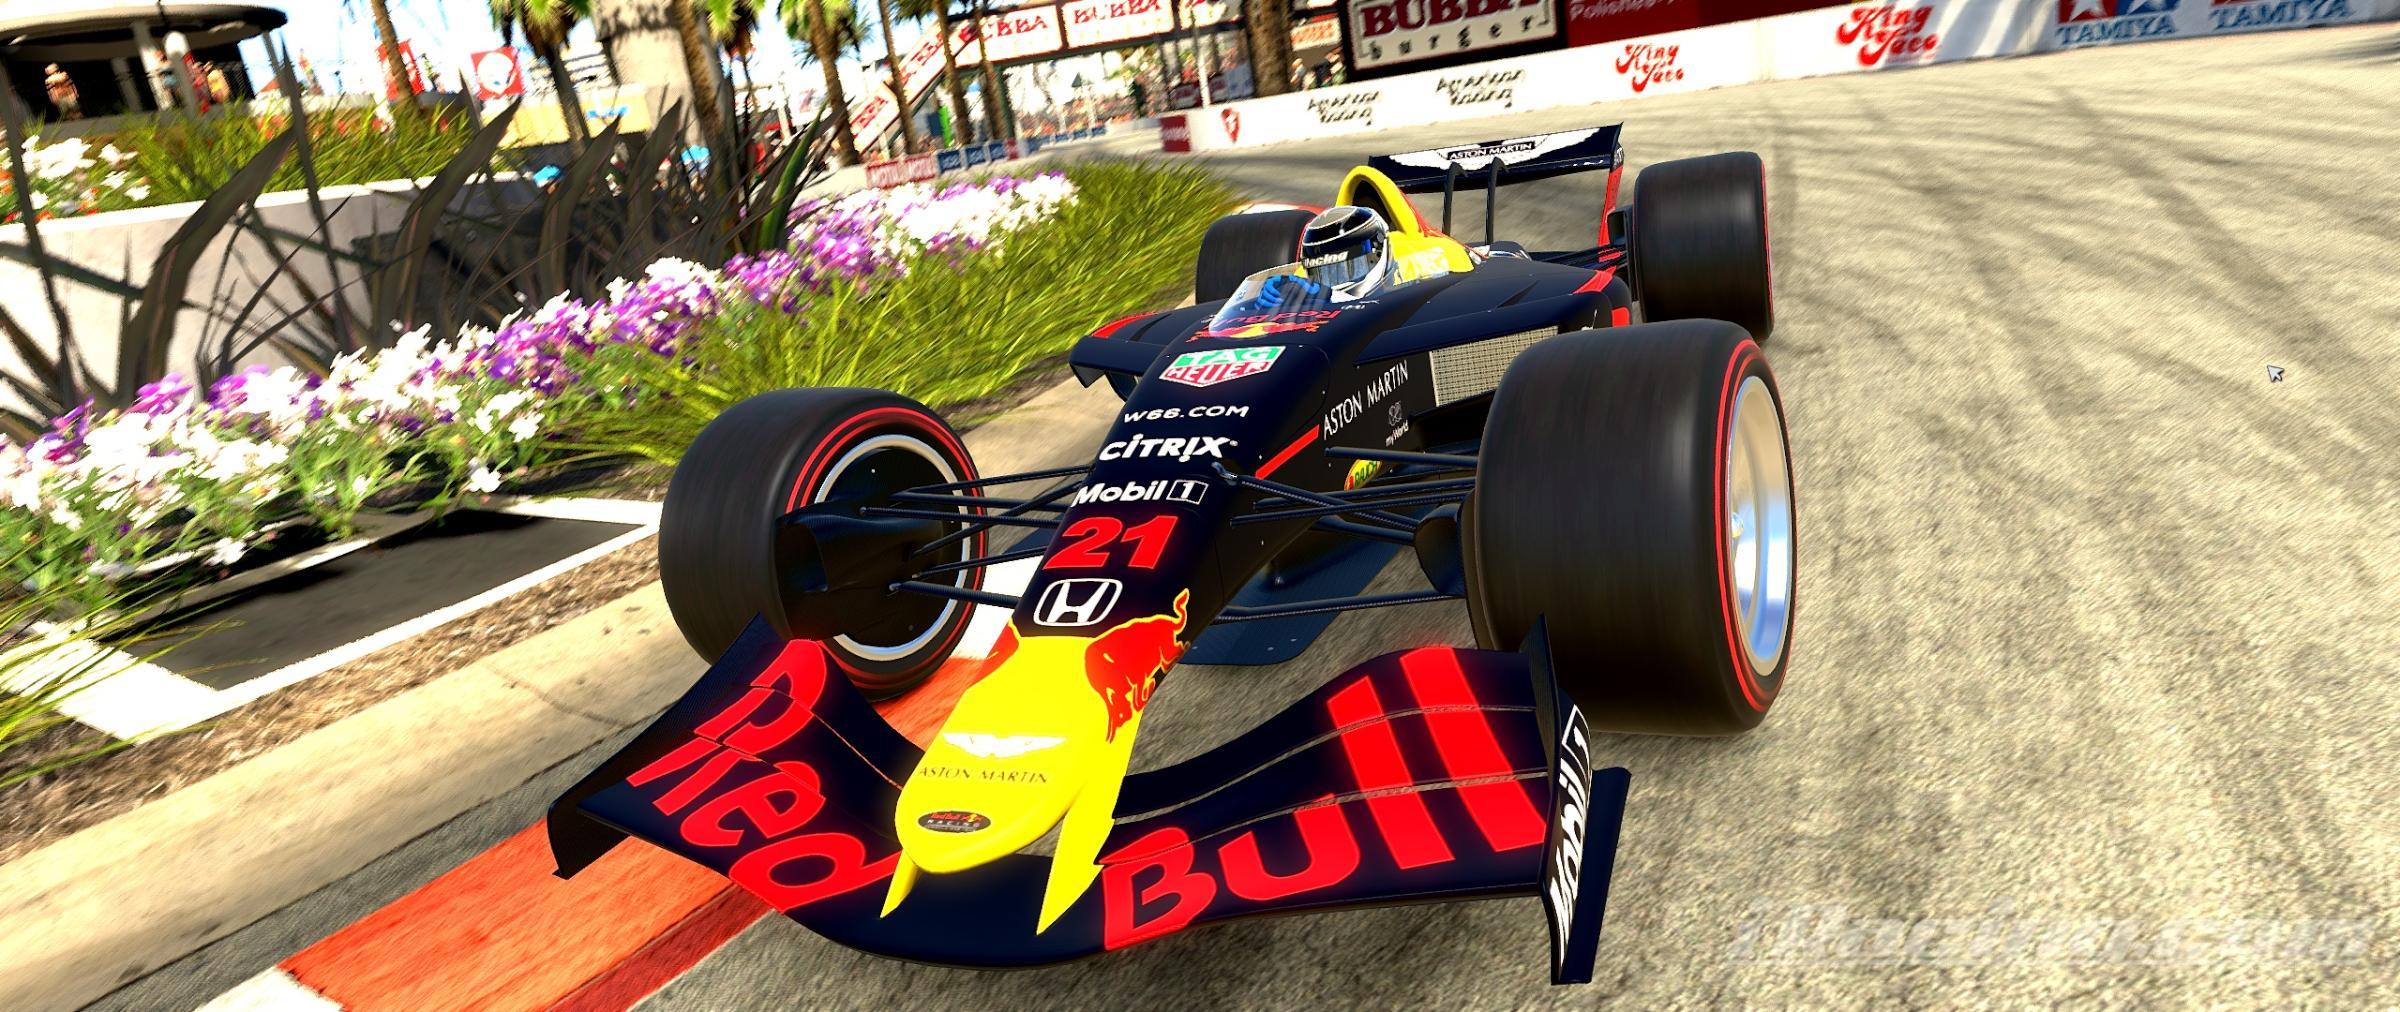 Preview of Aston Martin Red Bull Racing RB16 / iR-01 by Noriyuki Mizuno